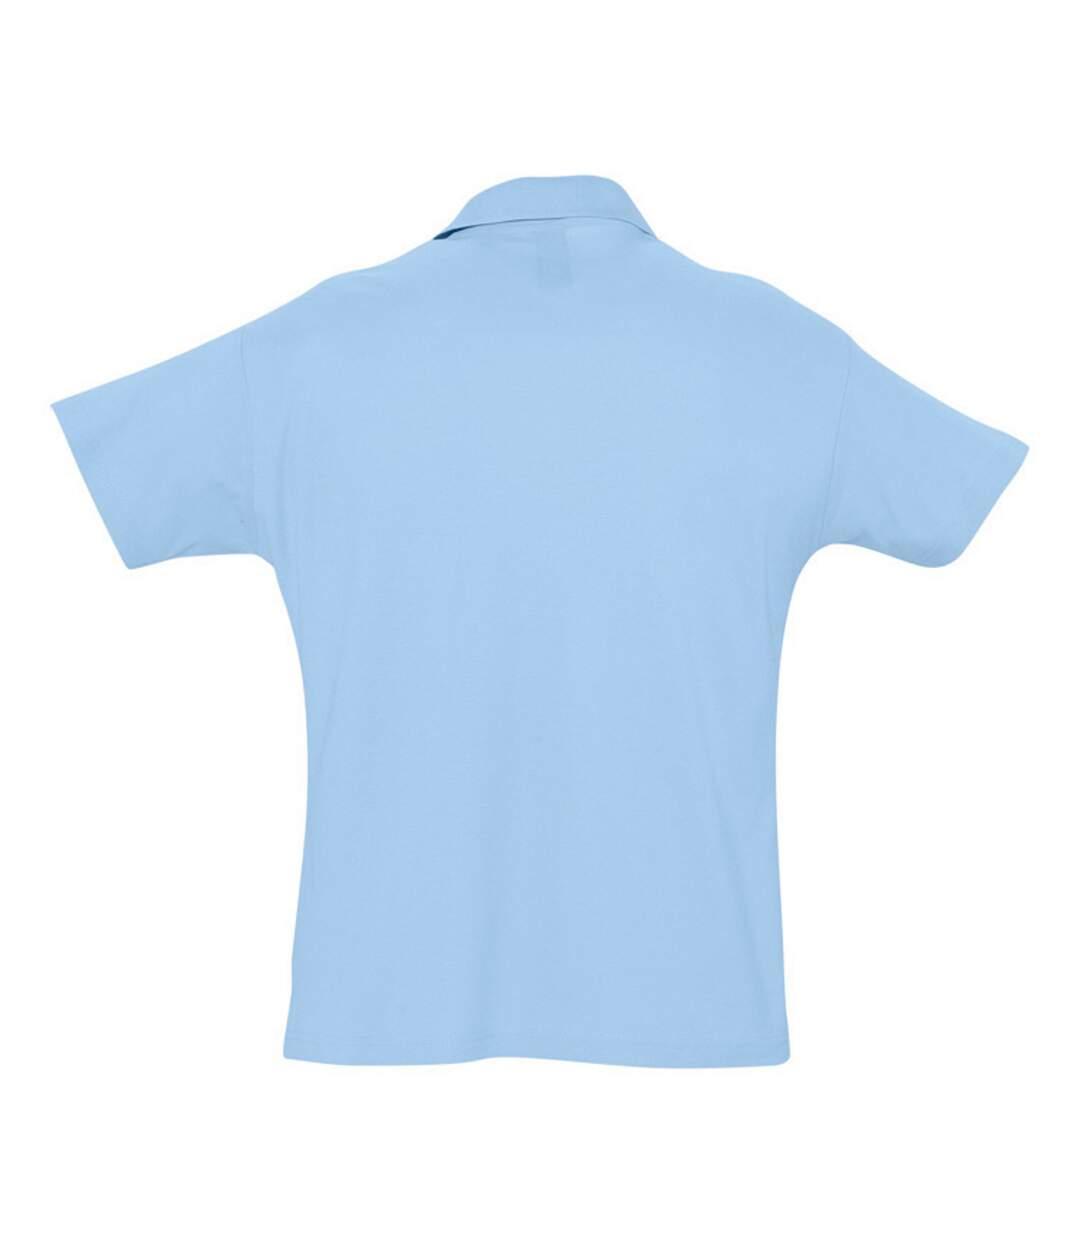 SOLS Mens Summer II Pique Short Sleeve Polo Shirt (Sky Blue) - UTPC318